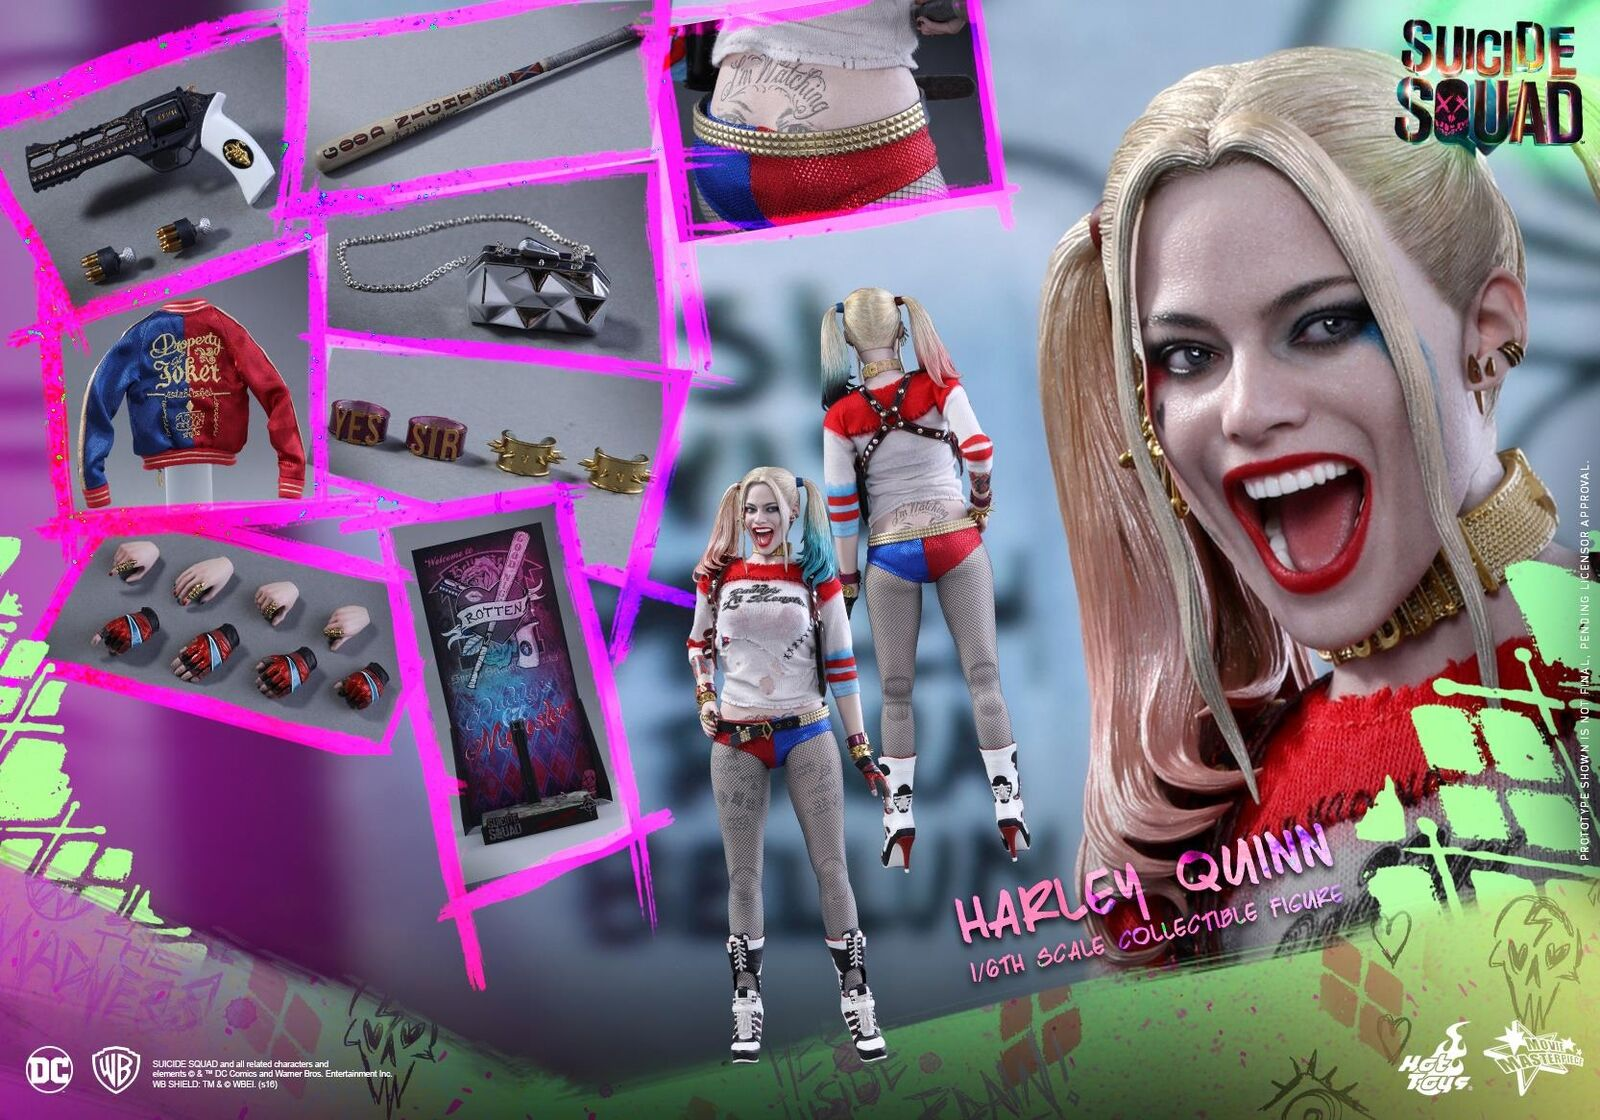 http://i.ebayimg.com/images/g/QYoAAOSw3HJZjX2e/s-l1600.jpg